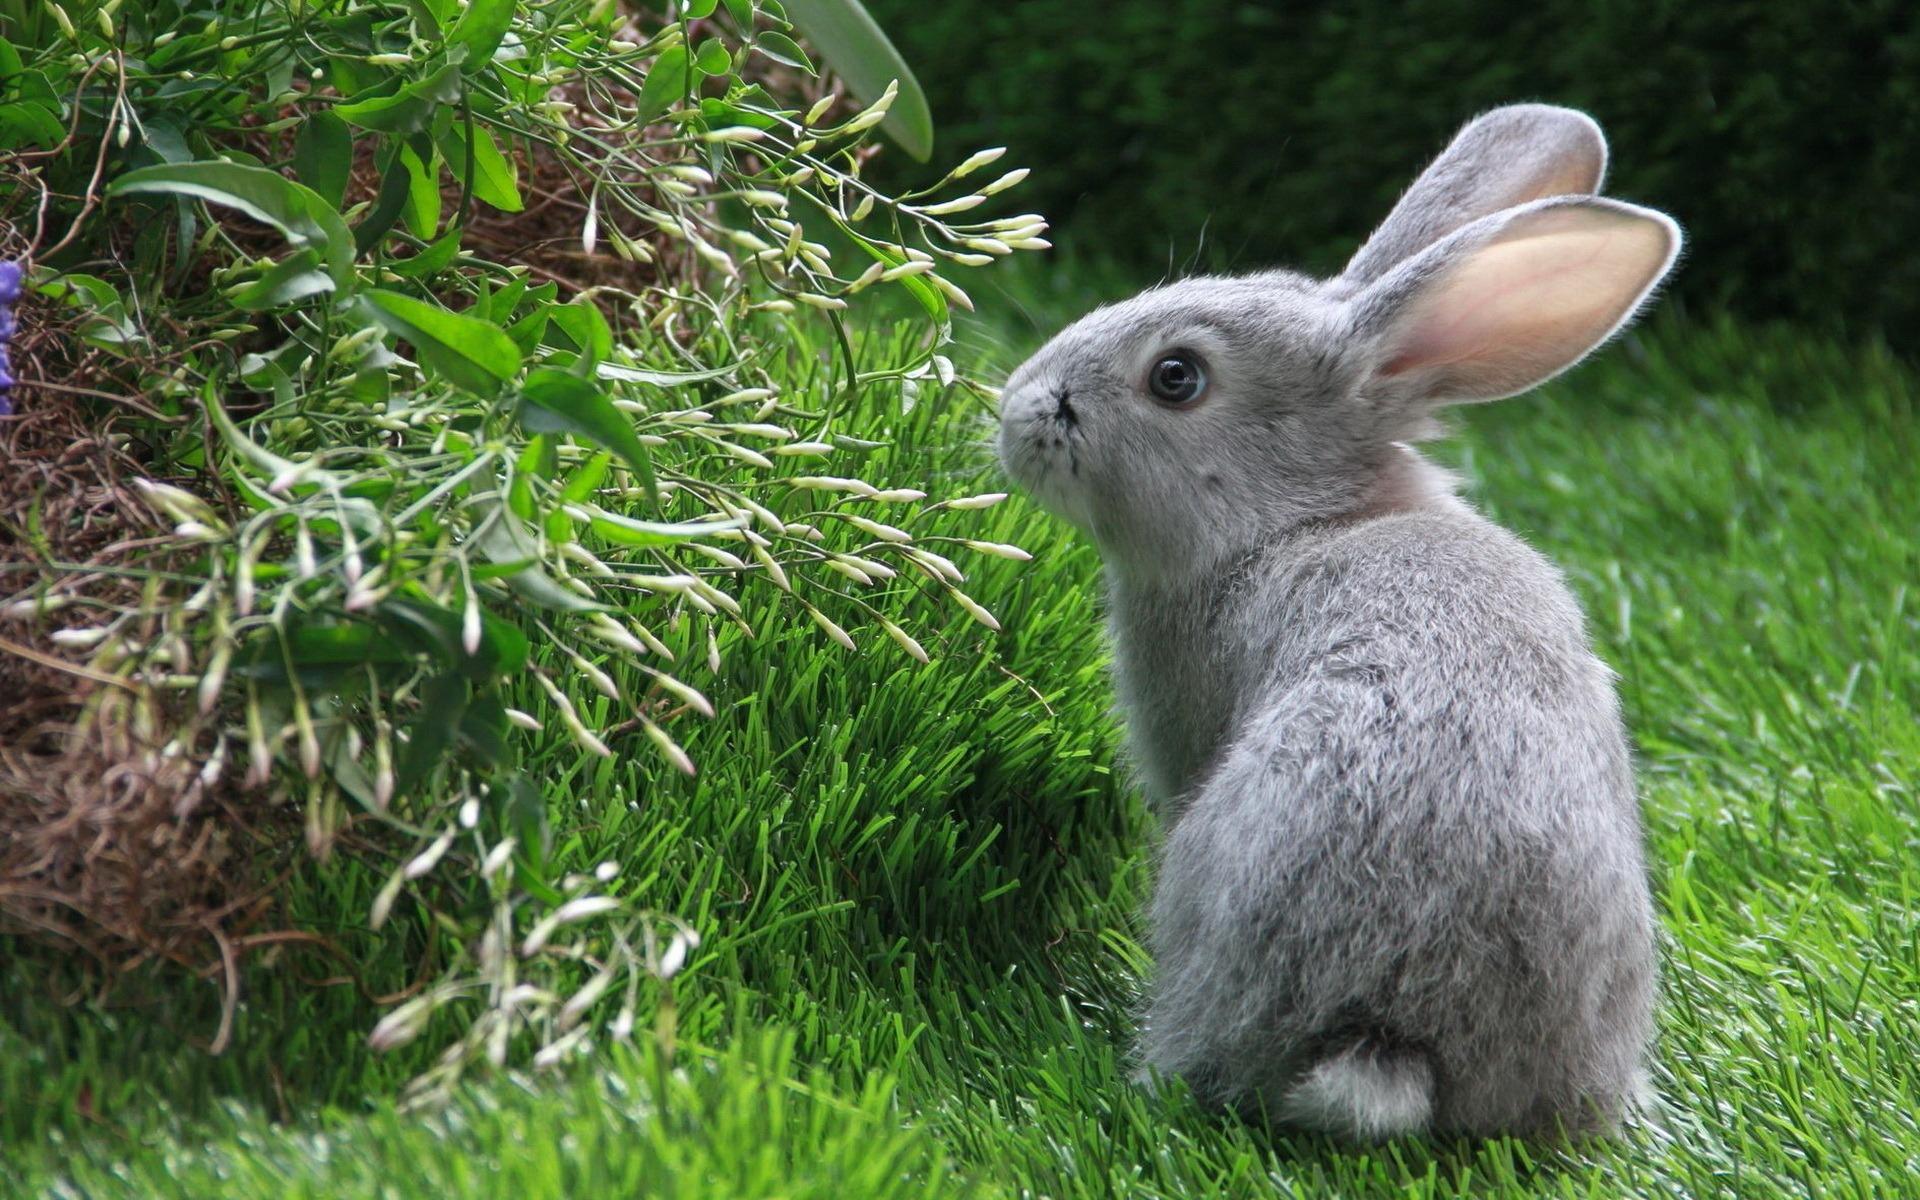 Image: Rabbit, grass, green, grey